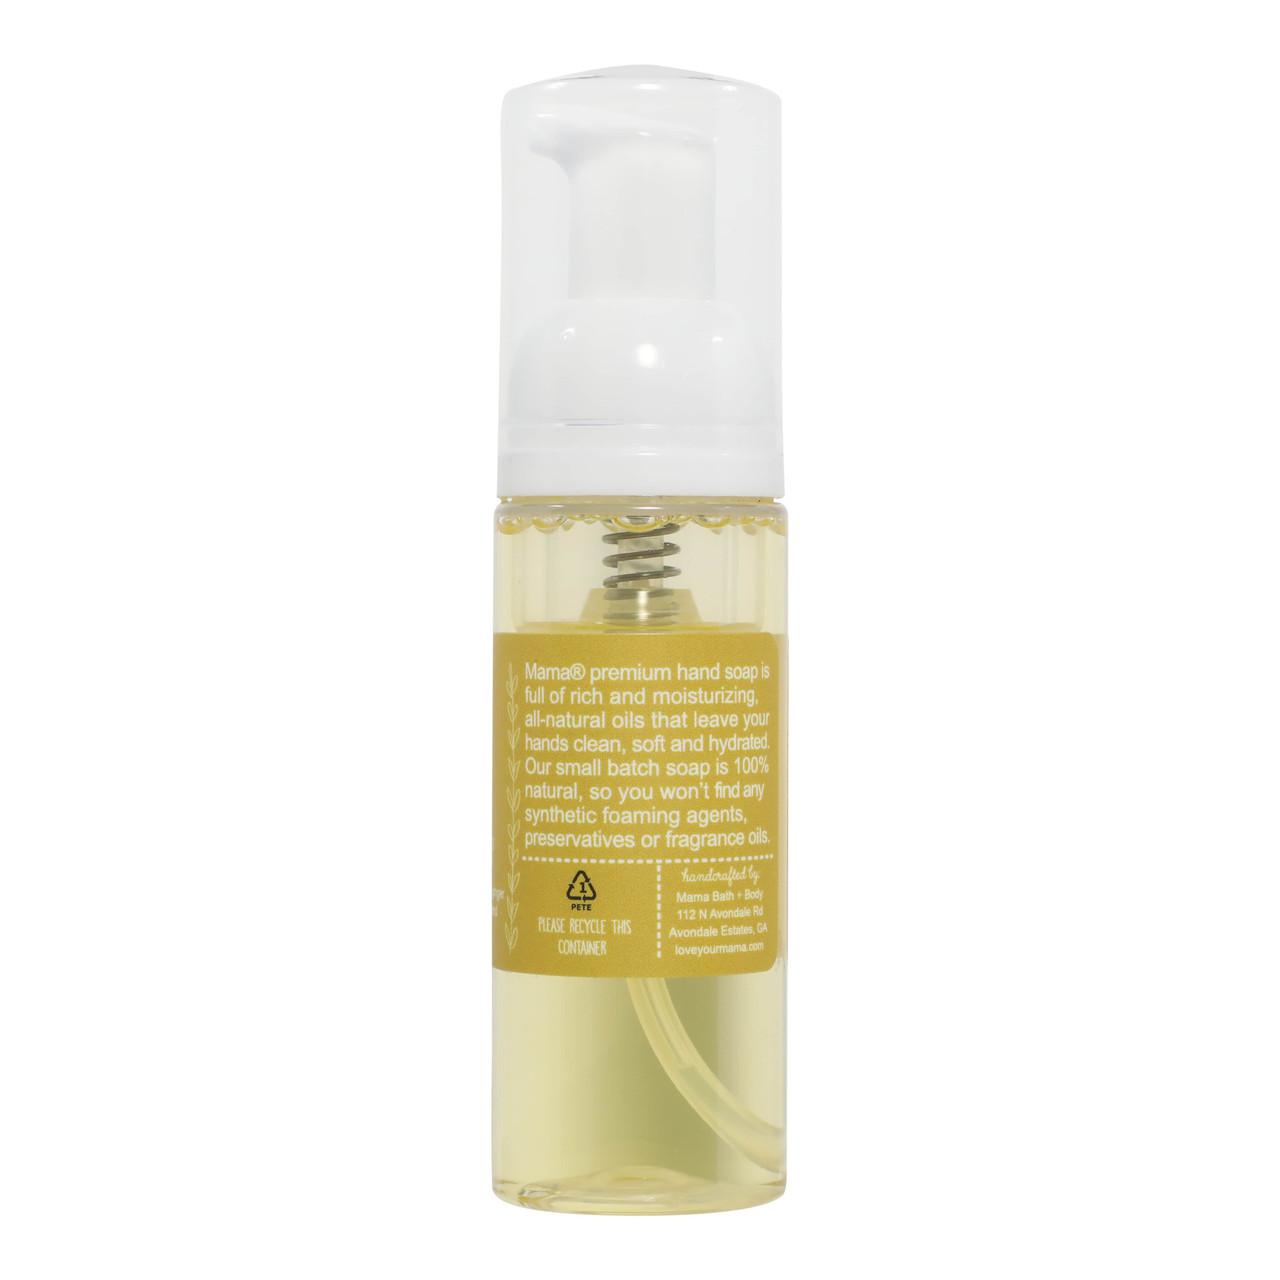 Zen (Lemongrass + Ginger) Travel Size Liquid Soap | Mama Bath + Body